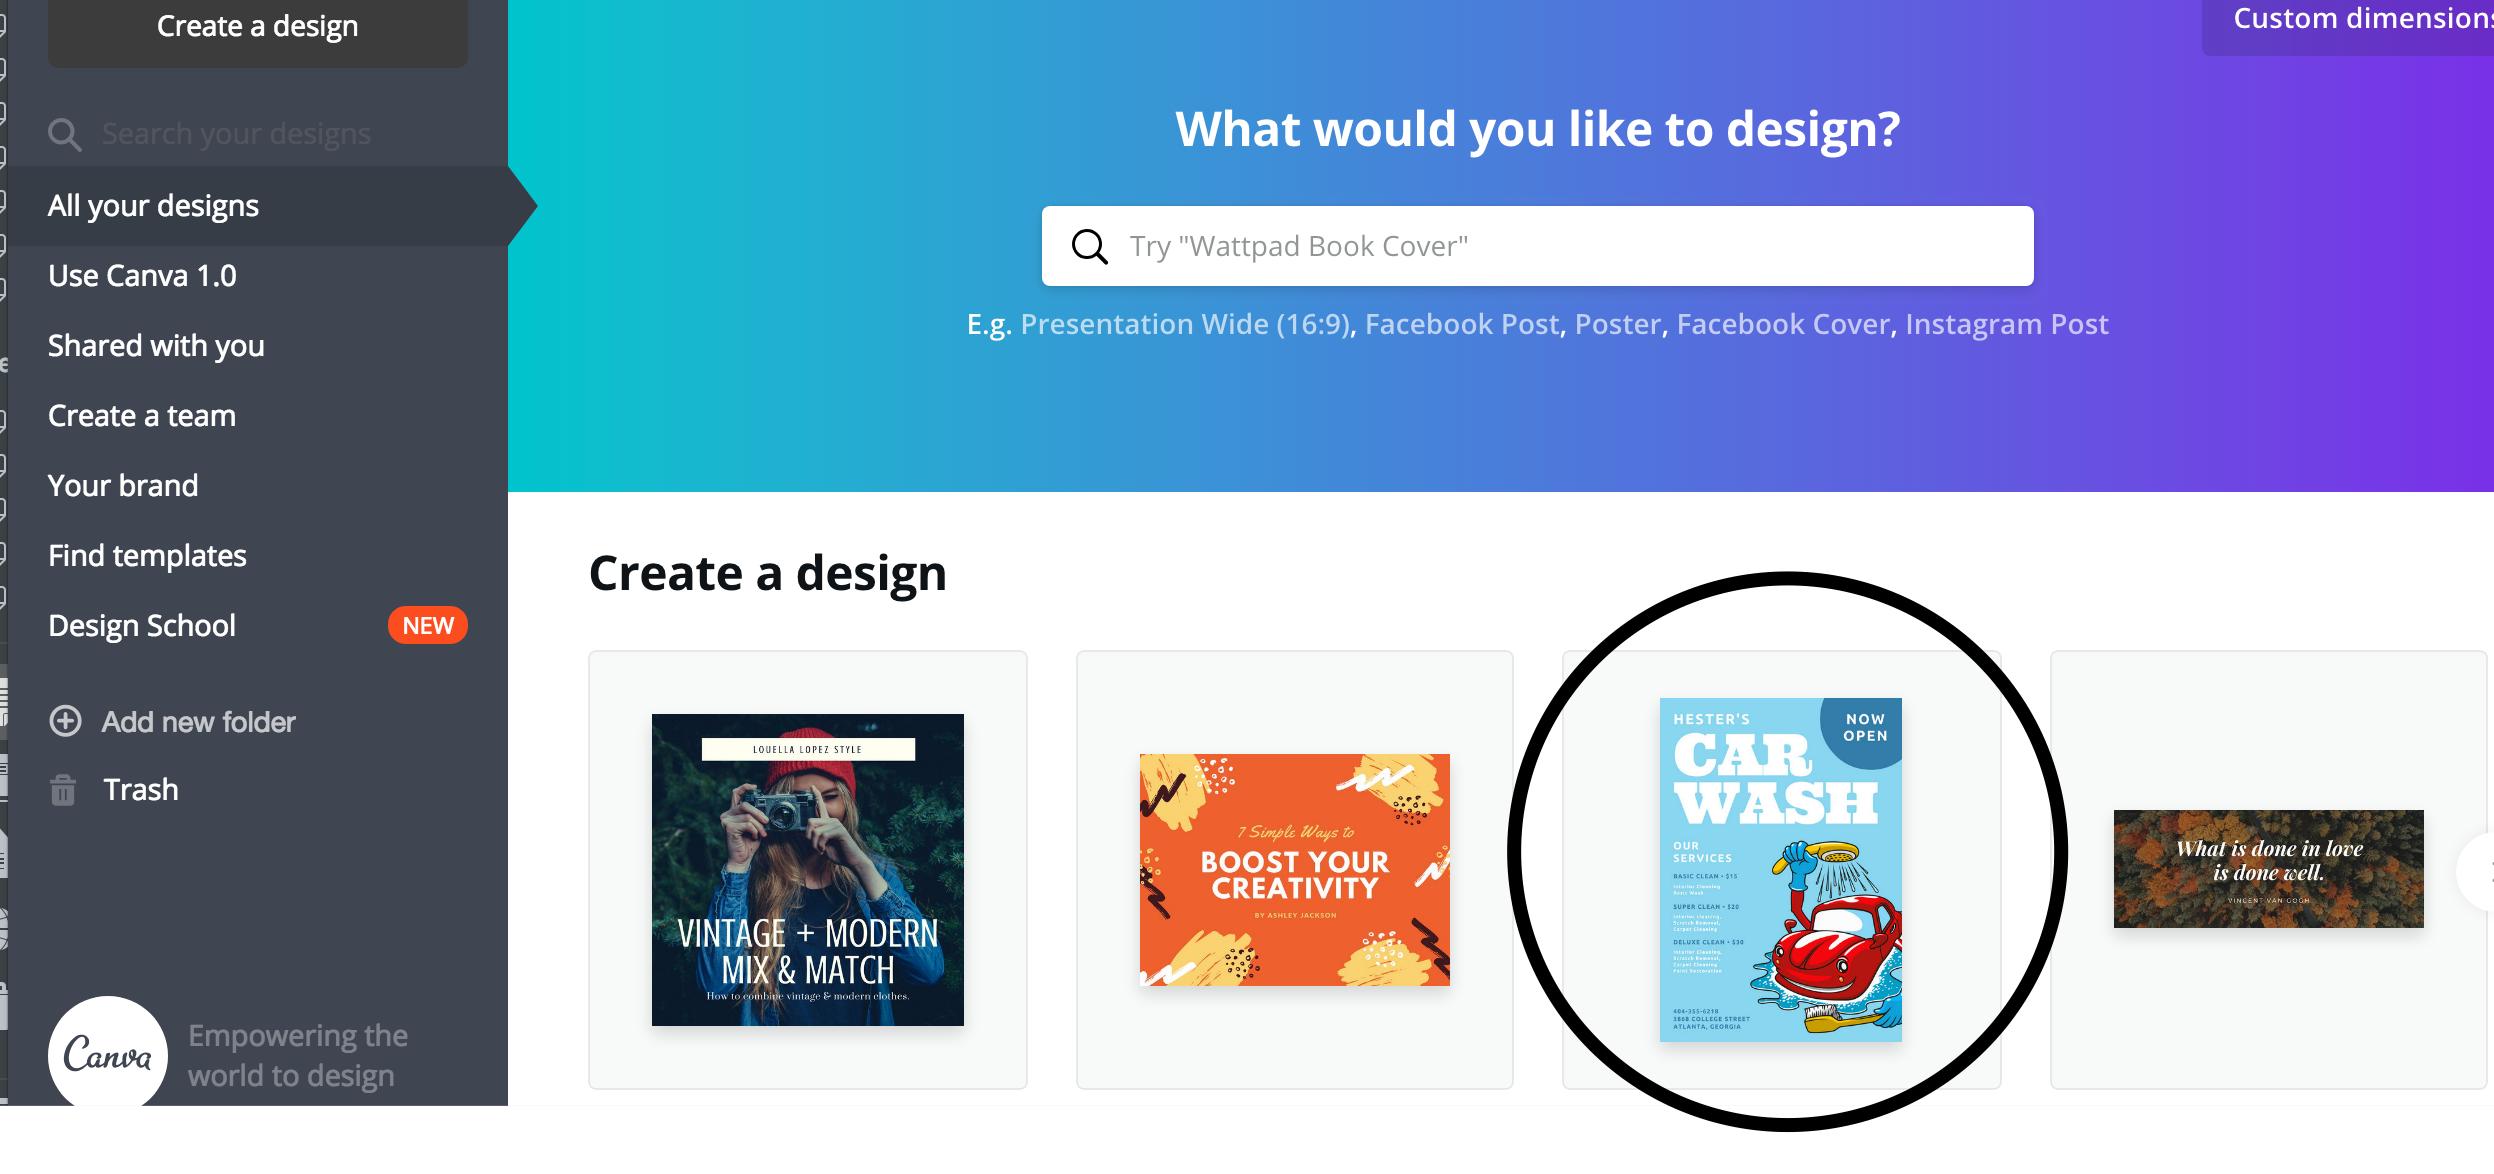 Select a design at Canva